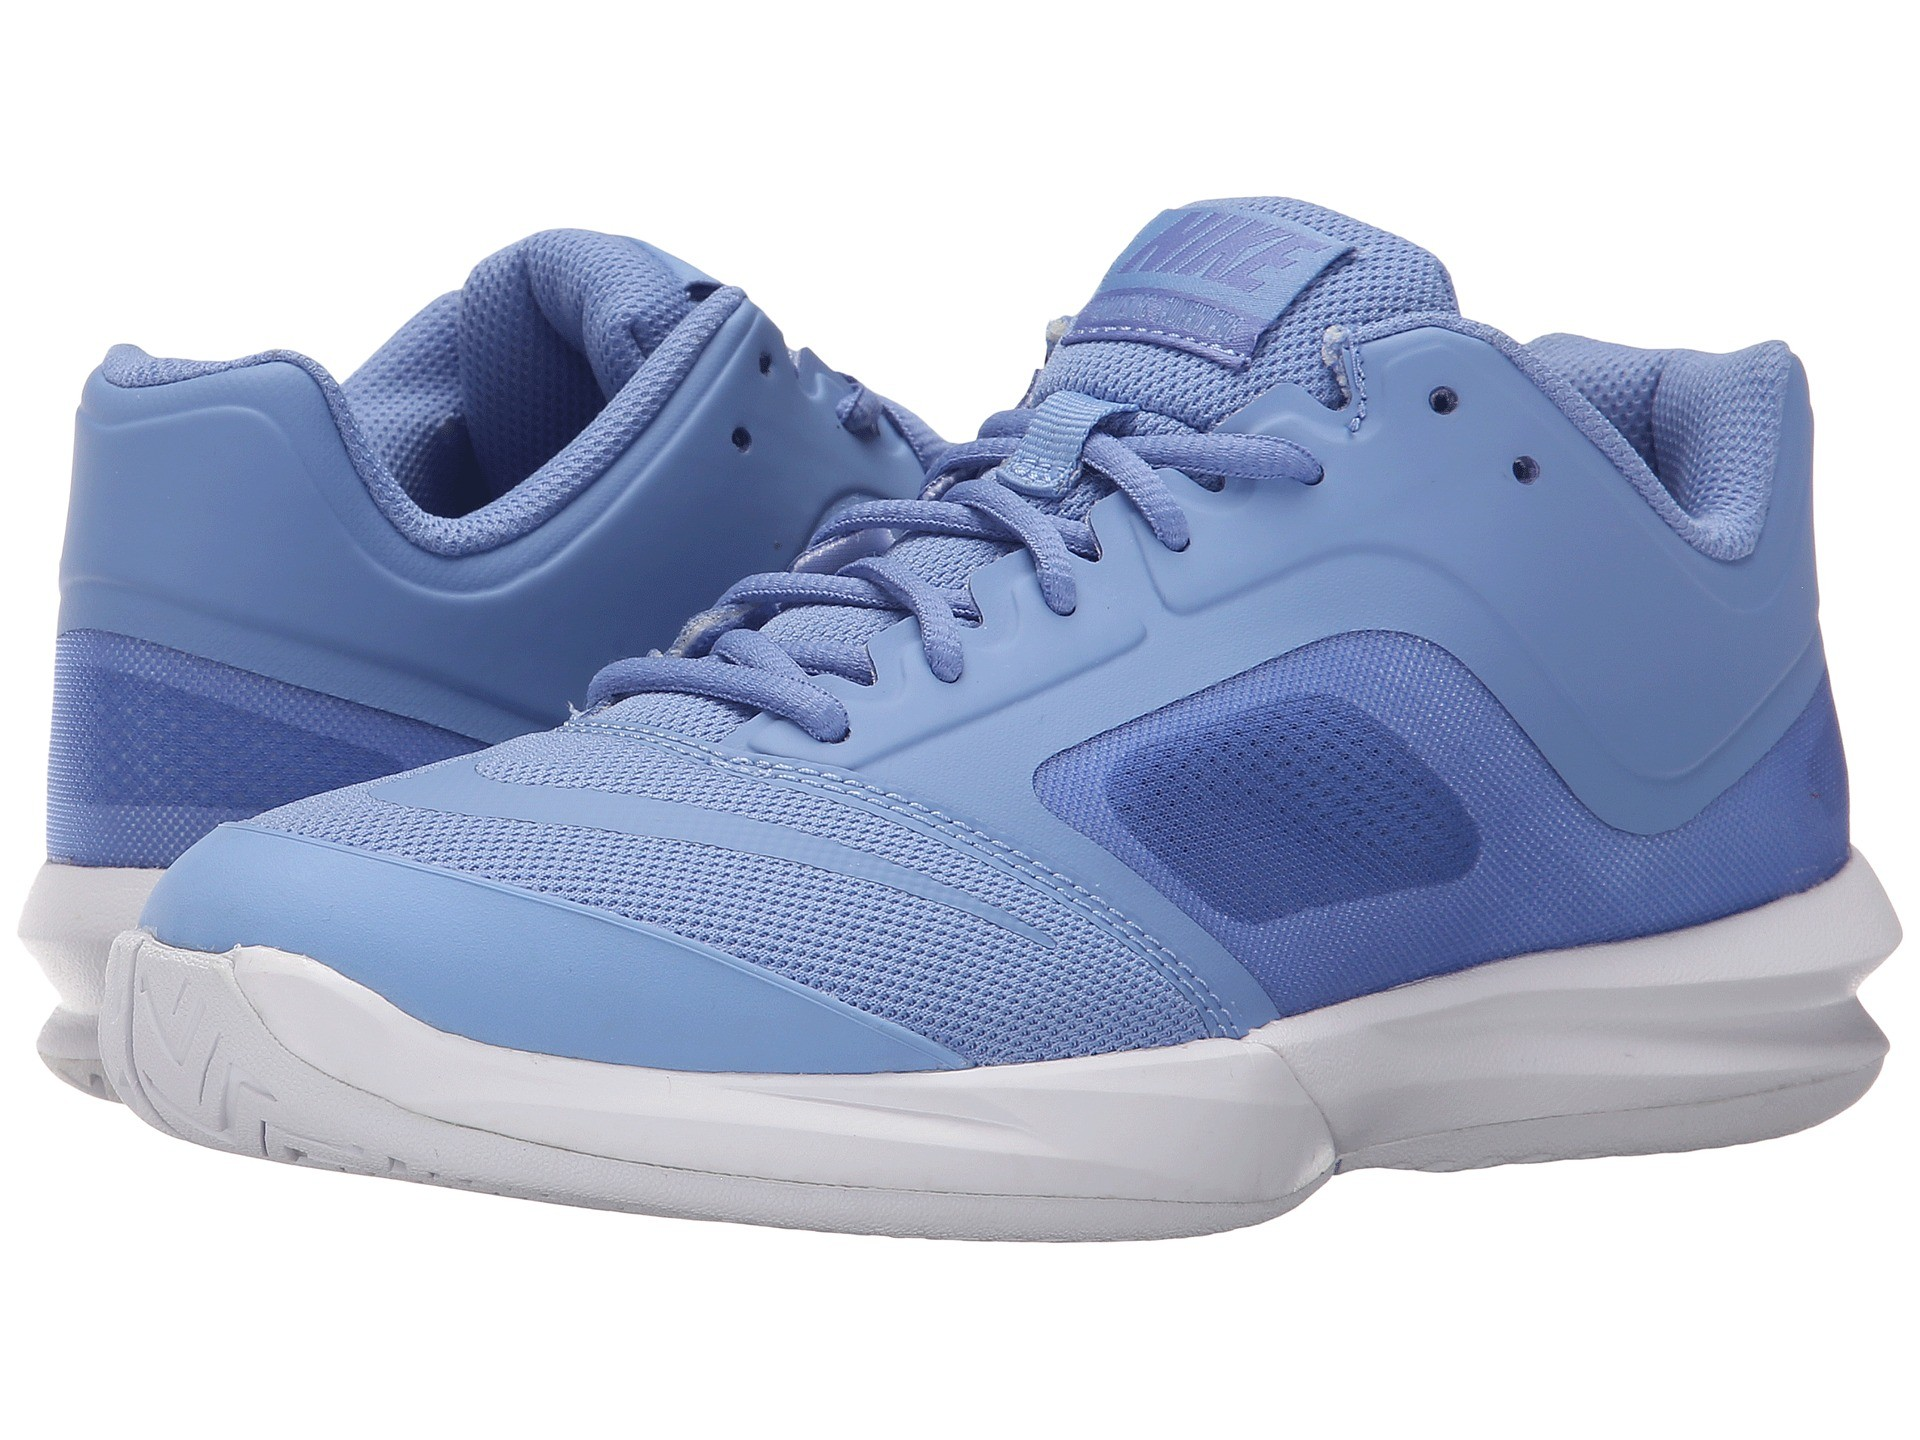 Dámská tenisová obuv Nike Ballistec Advantage blue/white UK 6 / EUR 40 / 25.5 cm